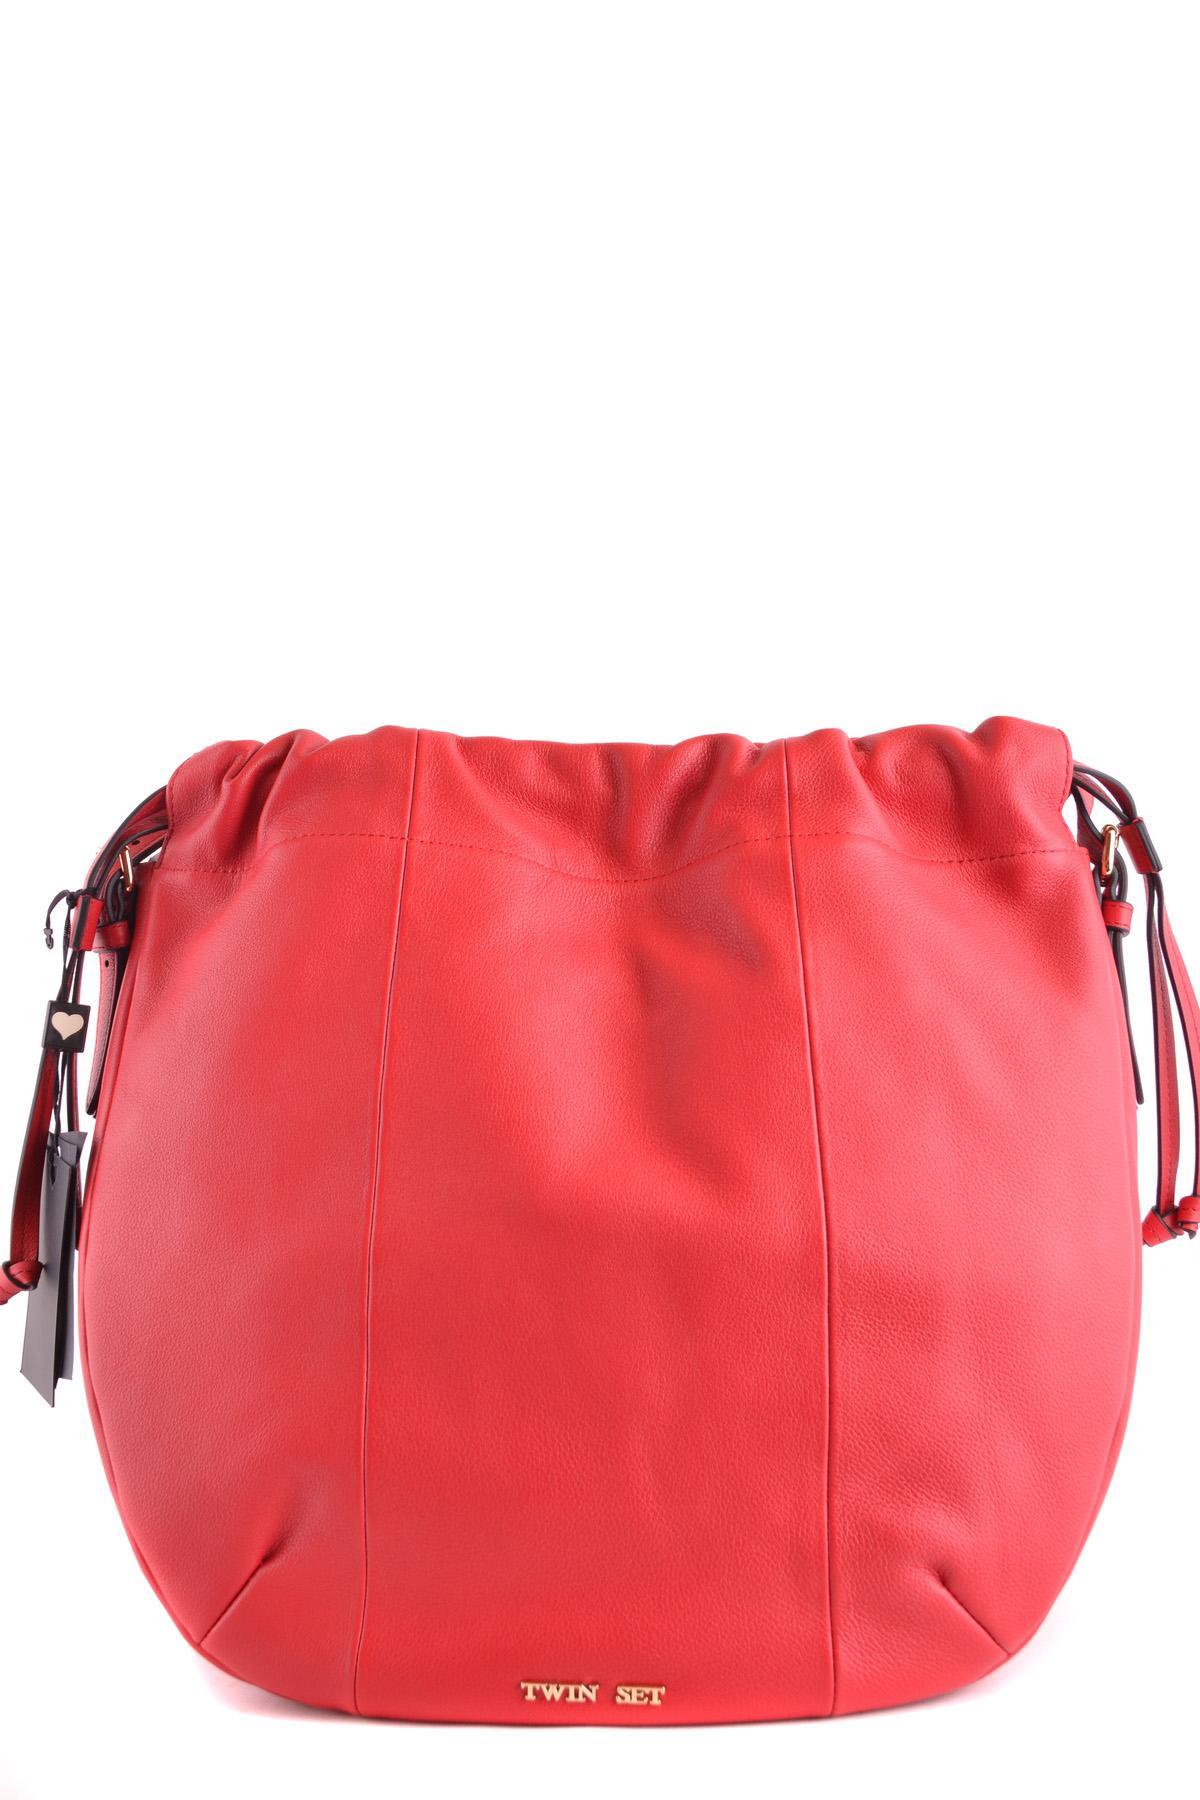 13d9bfa7bc3a Simona Twin Barbieri Lyst Red In Bags Set 5q1WqP